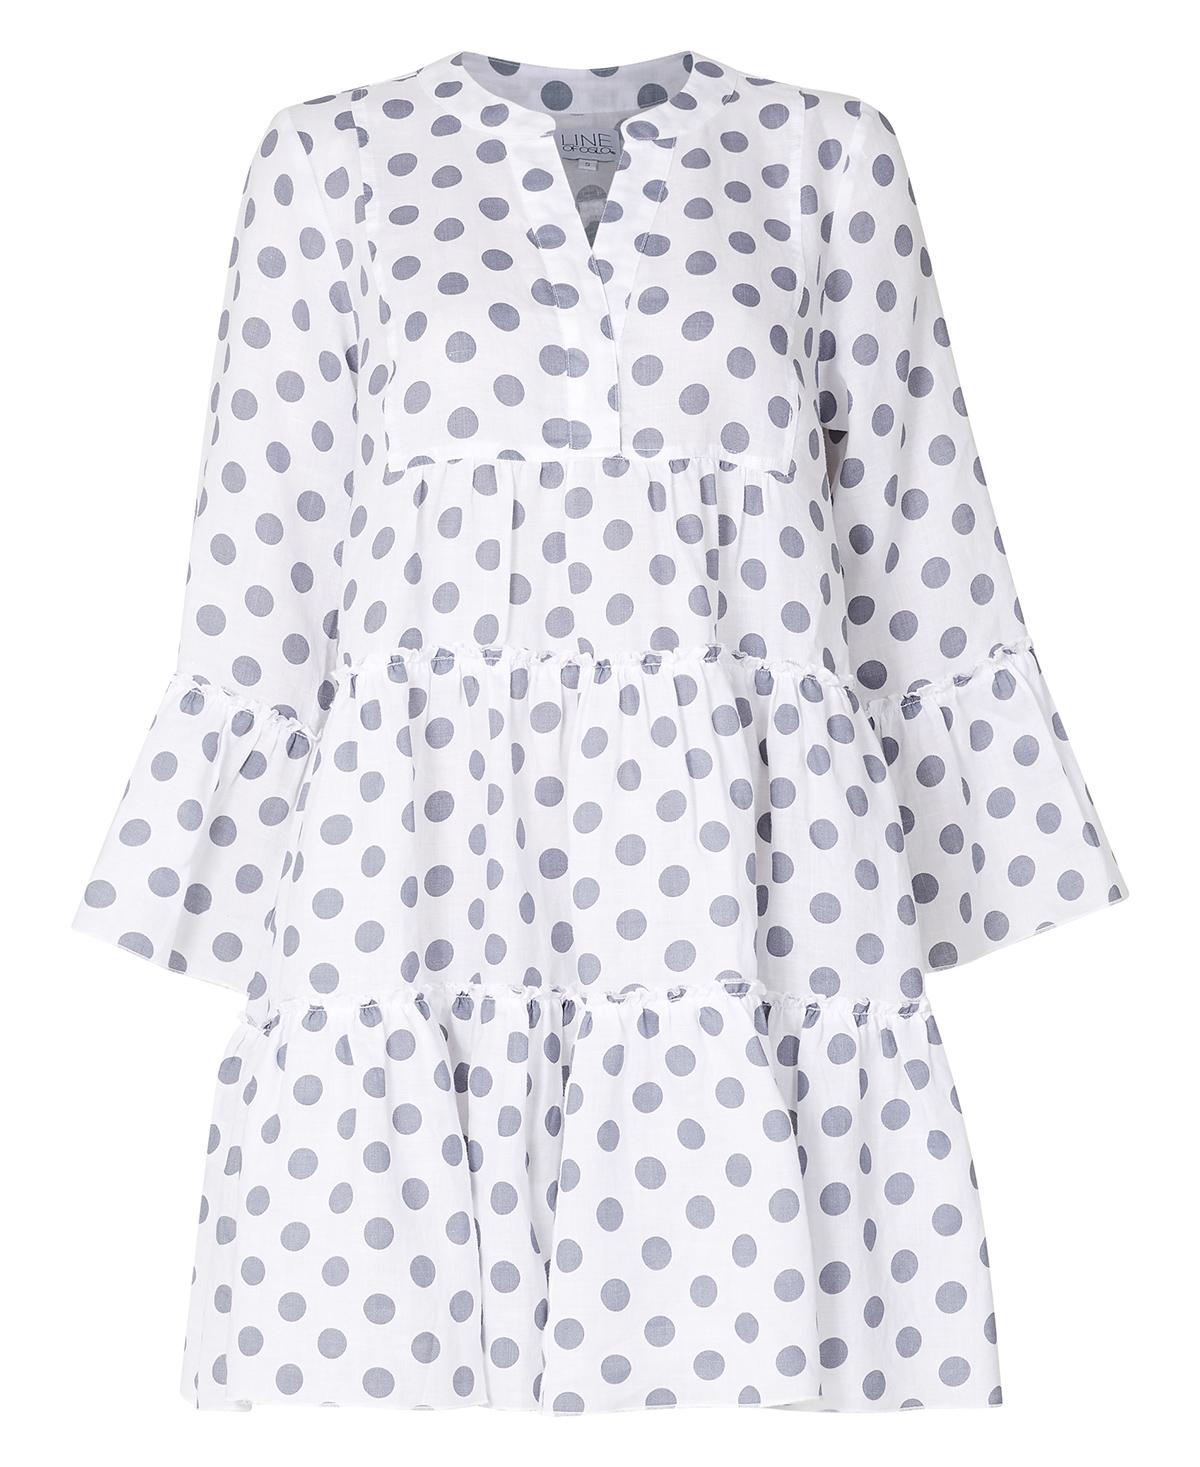 Daisy dot dress